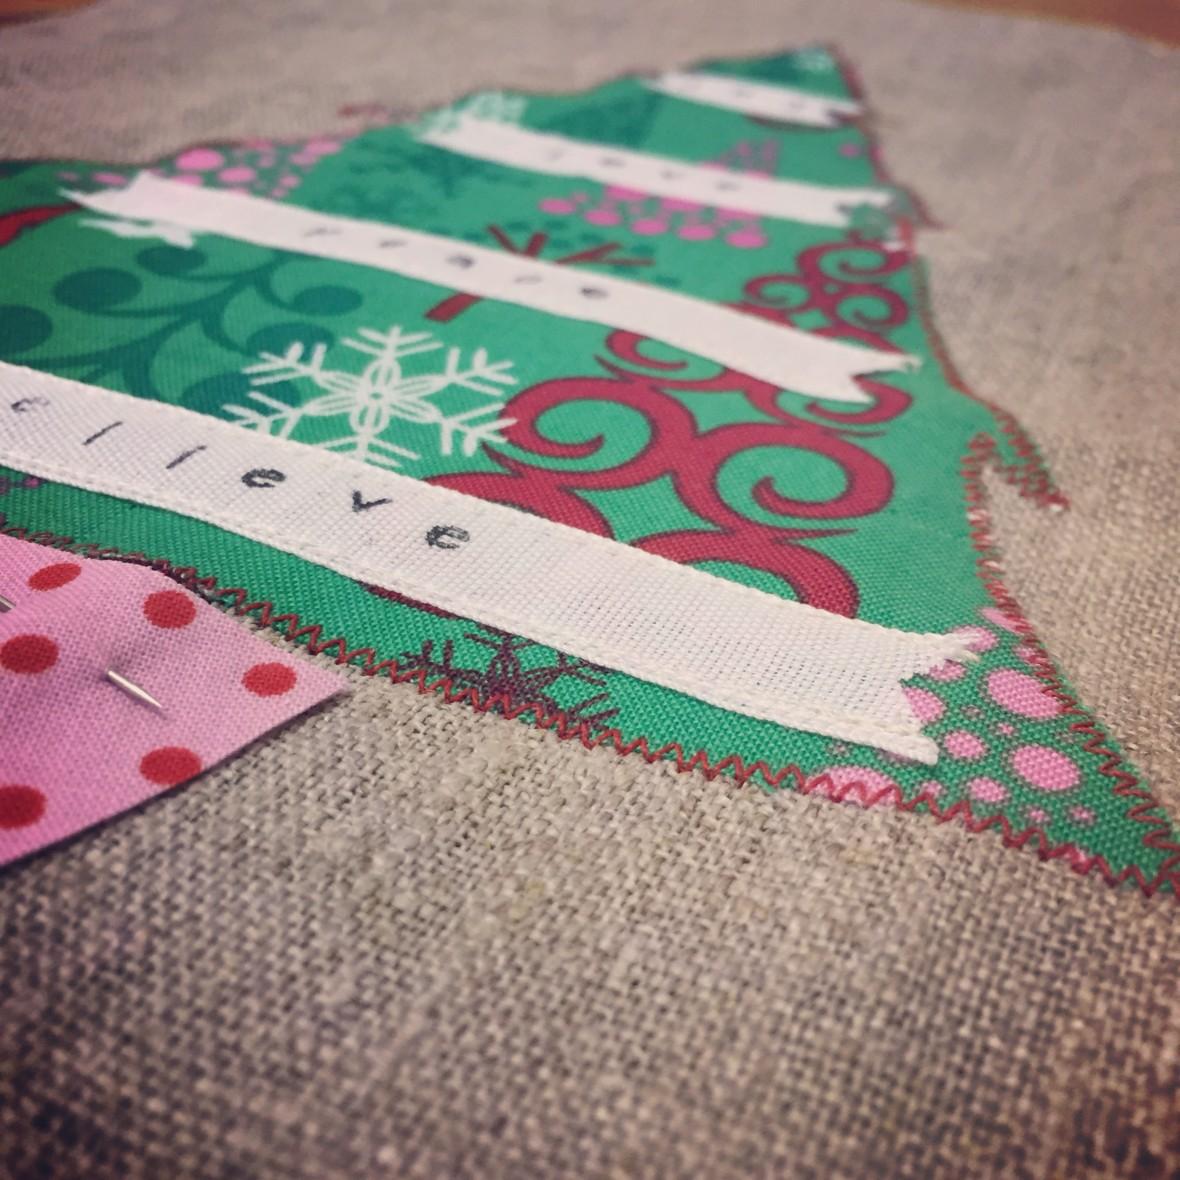 Beginner Sewing Skills - Christmas Style!